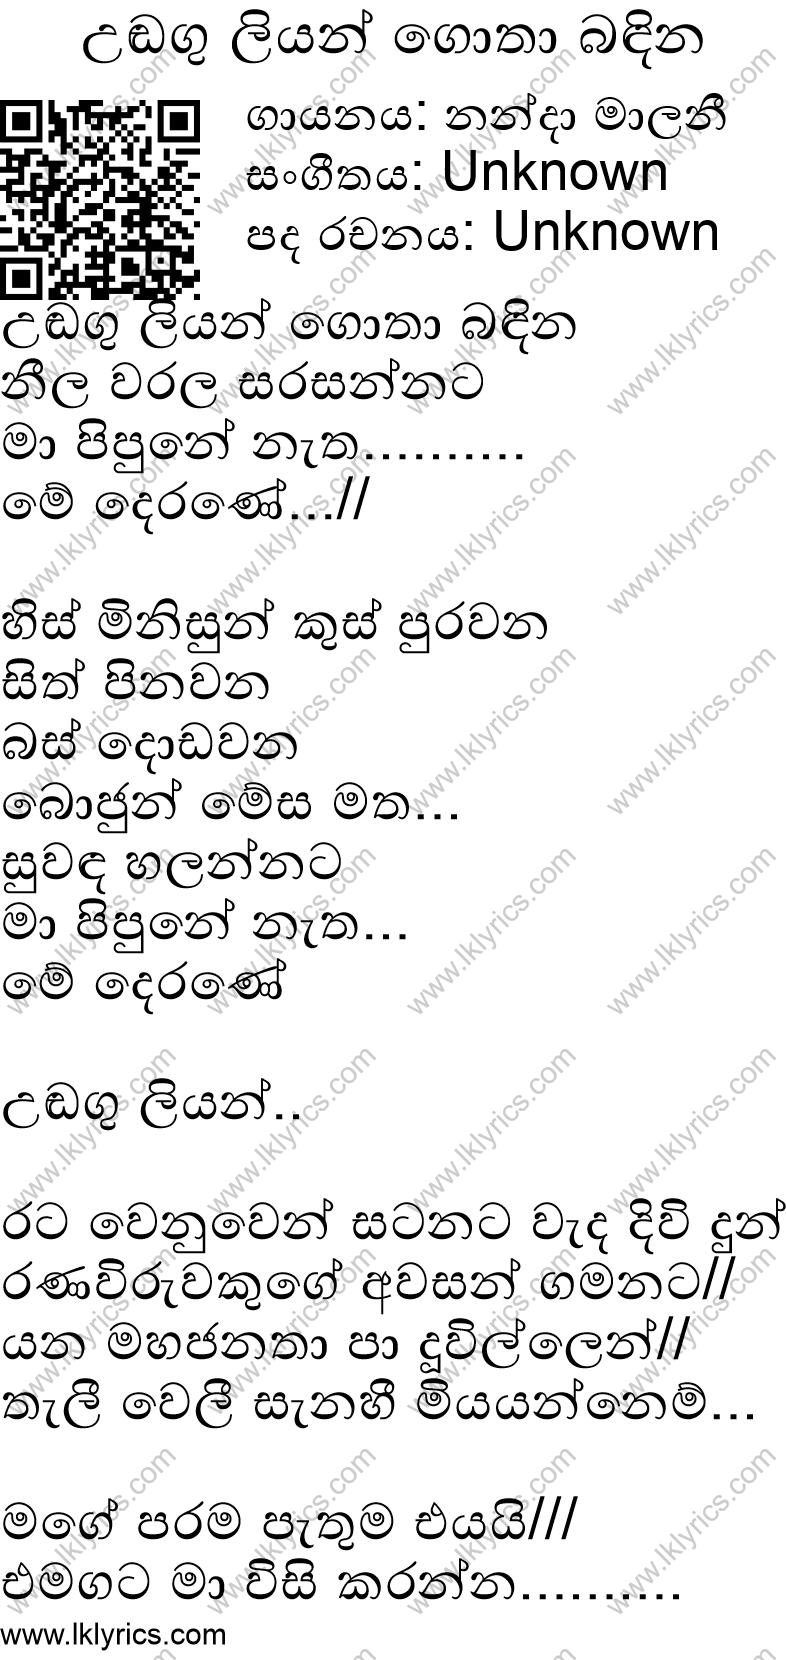 udagu liyan gotha bandina lyrics